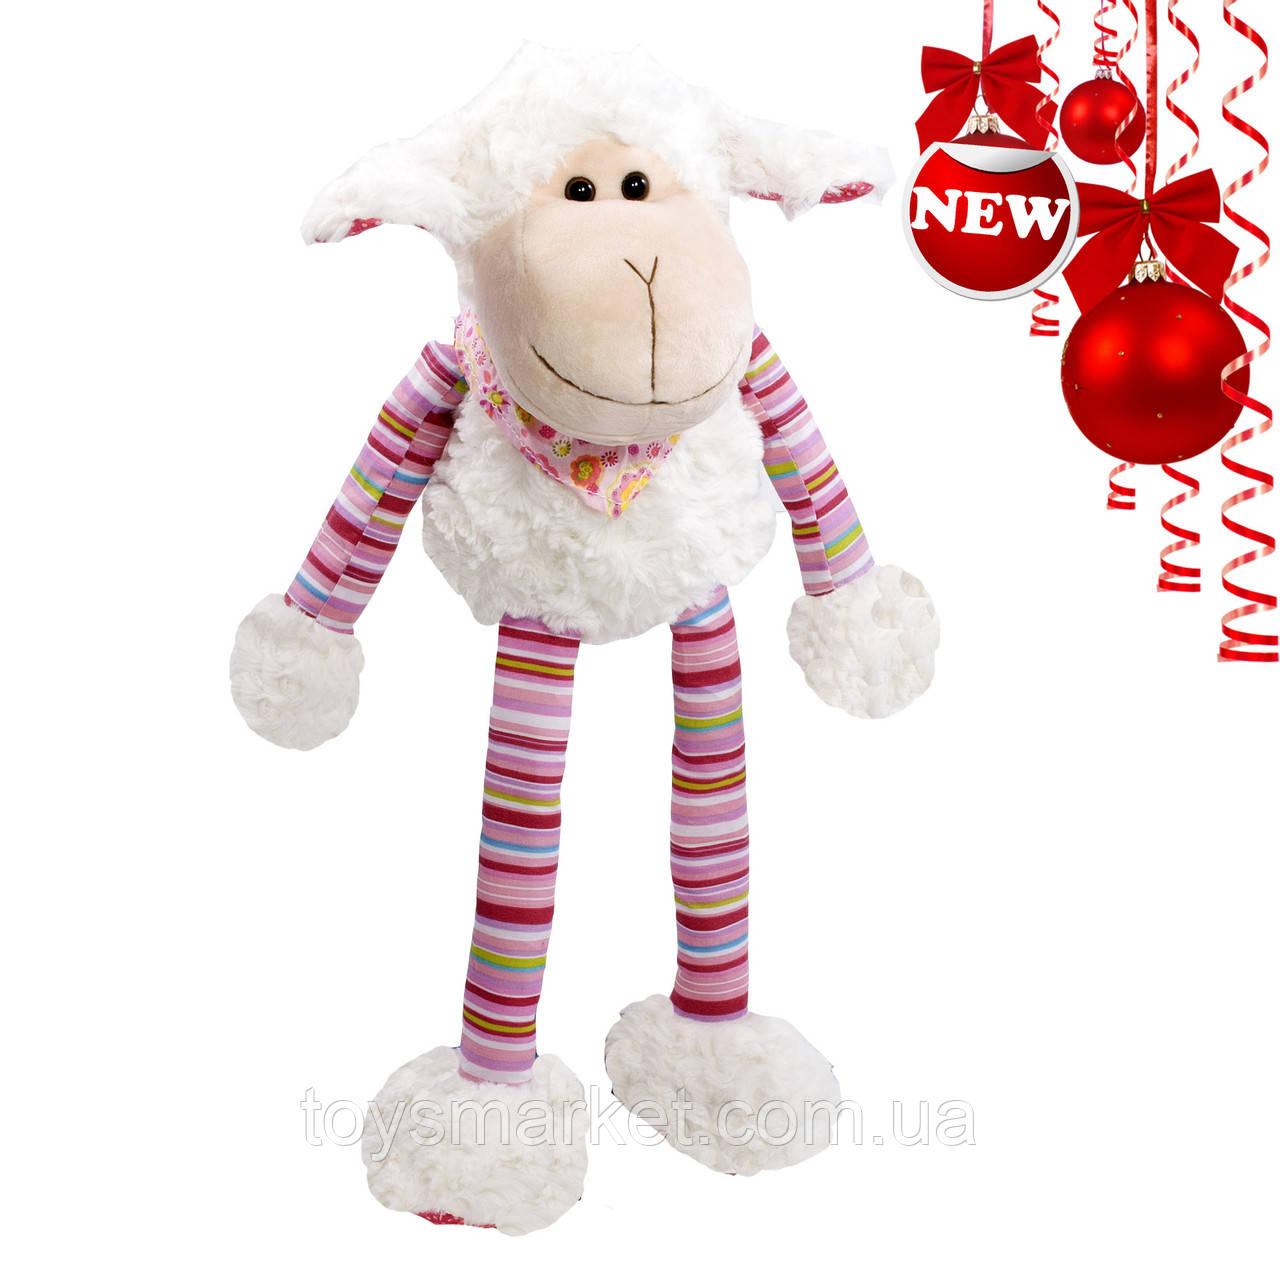 Мягкая игрушка овечка Бяшка, белая